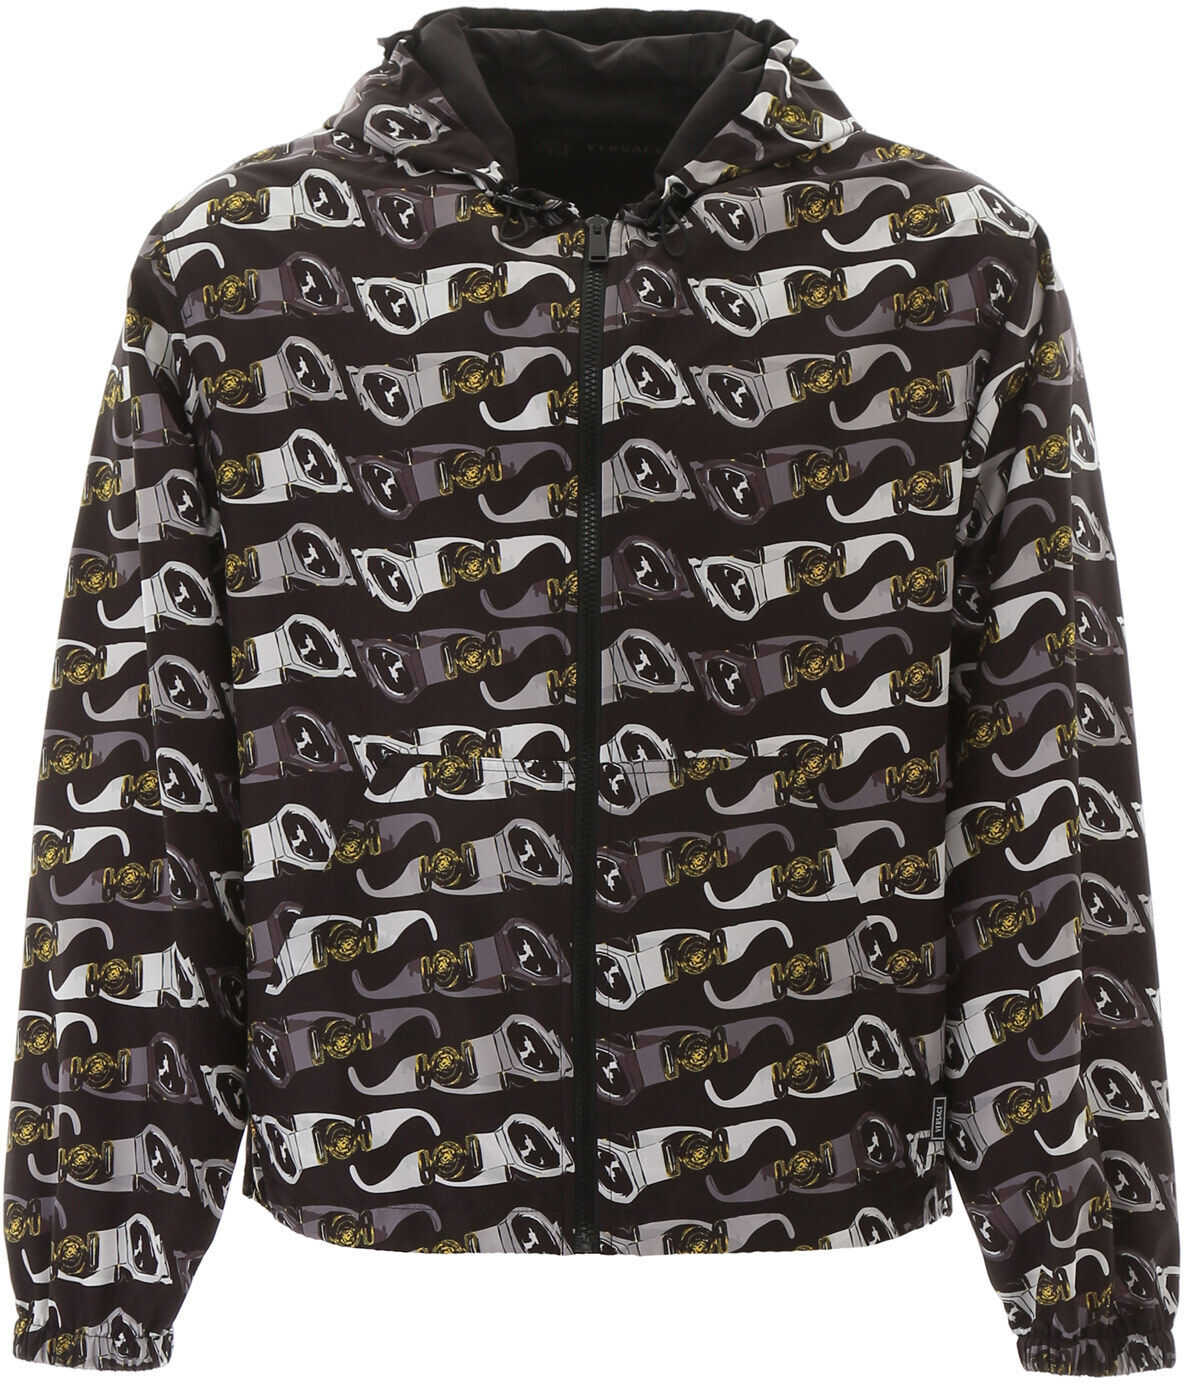 Versace Medusa Biggie Print Jacket FDO NERO STAMPA imagine